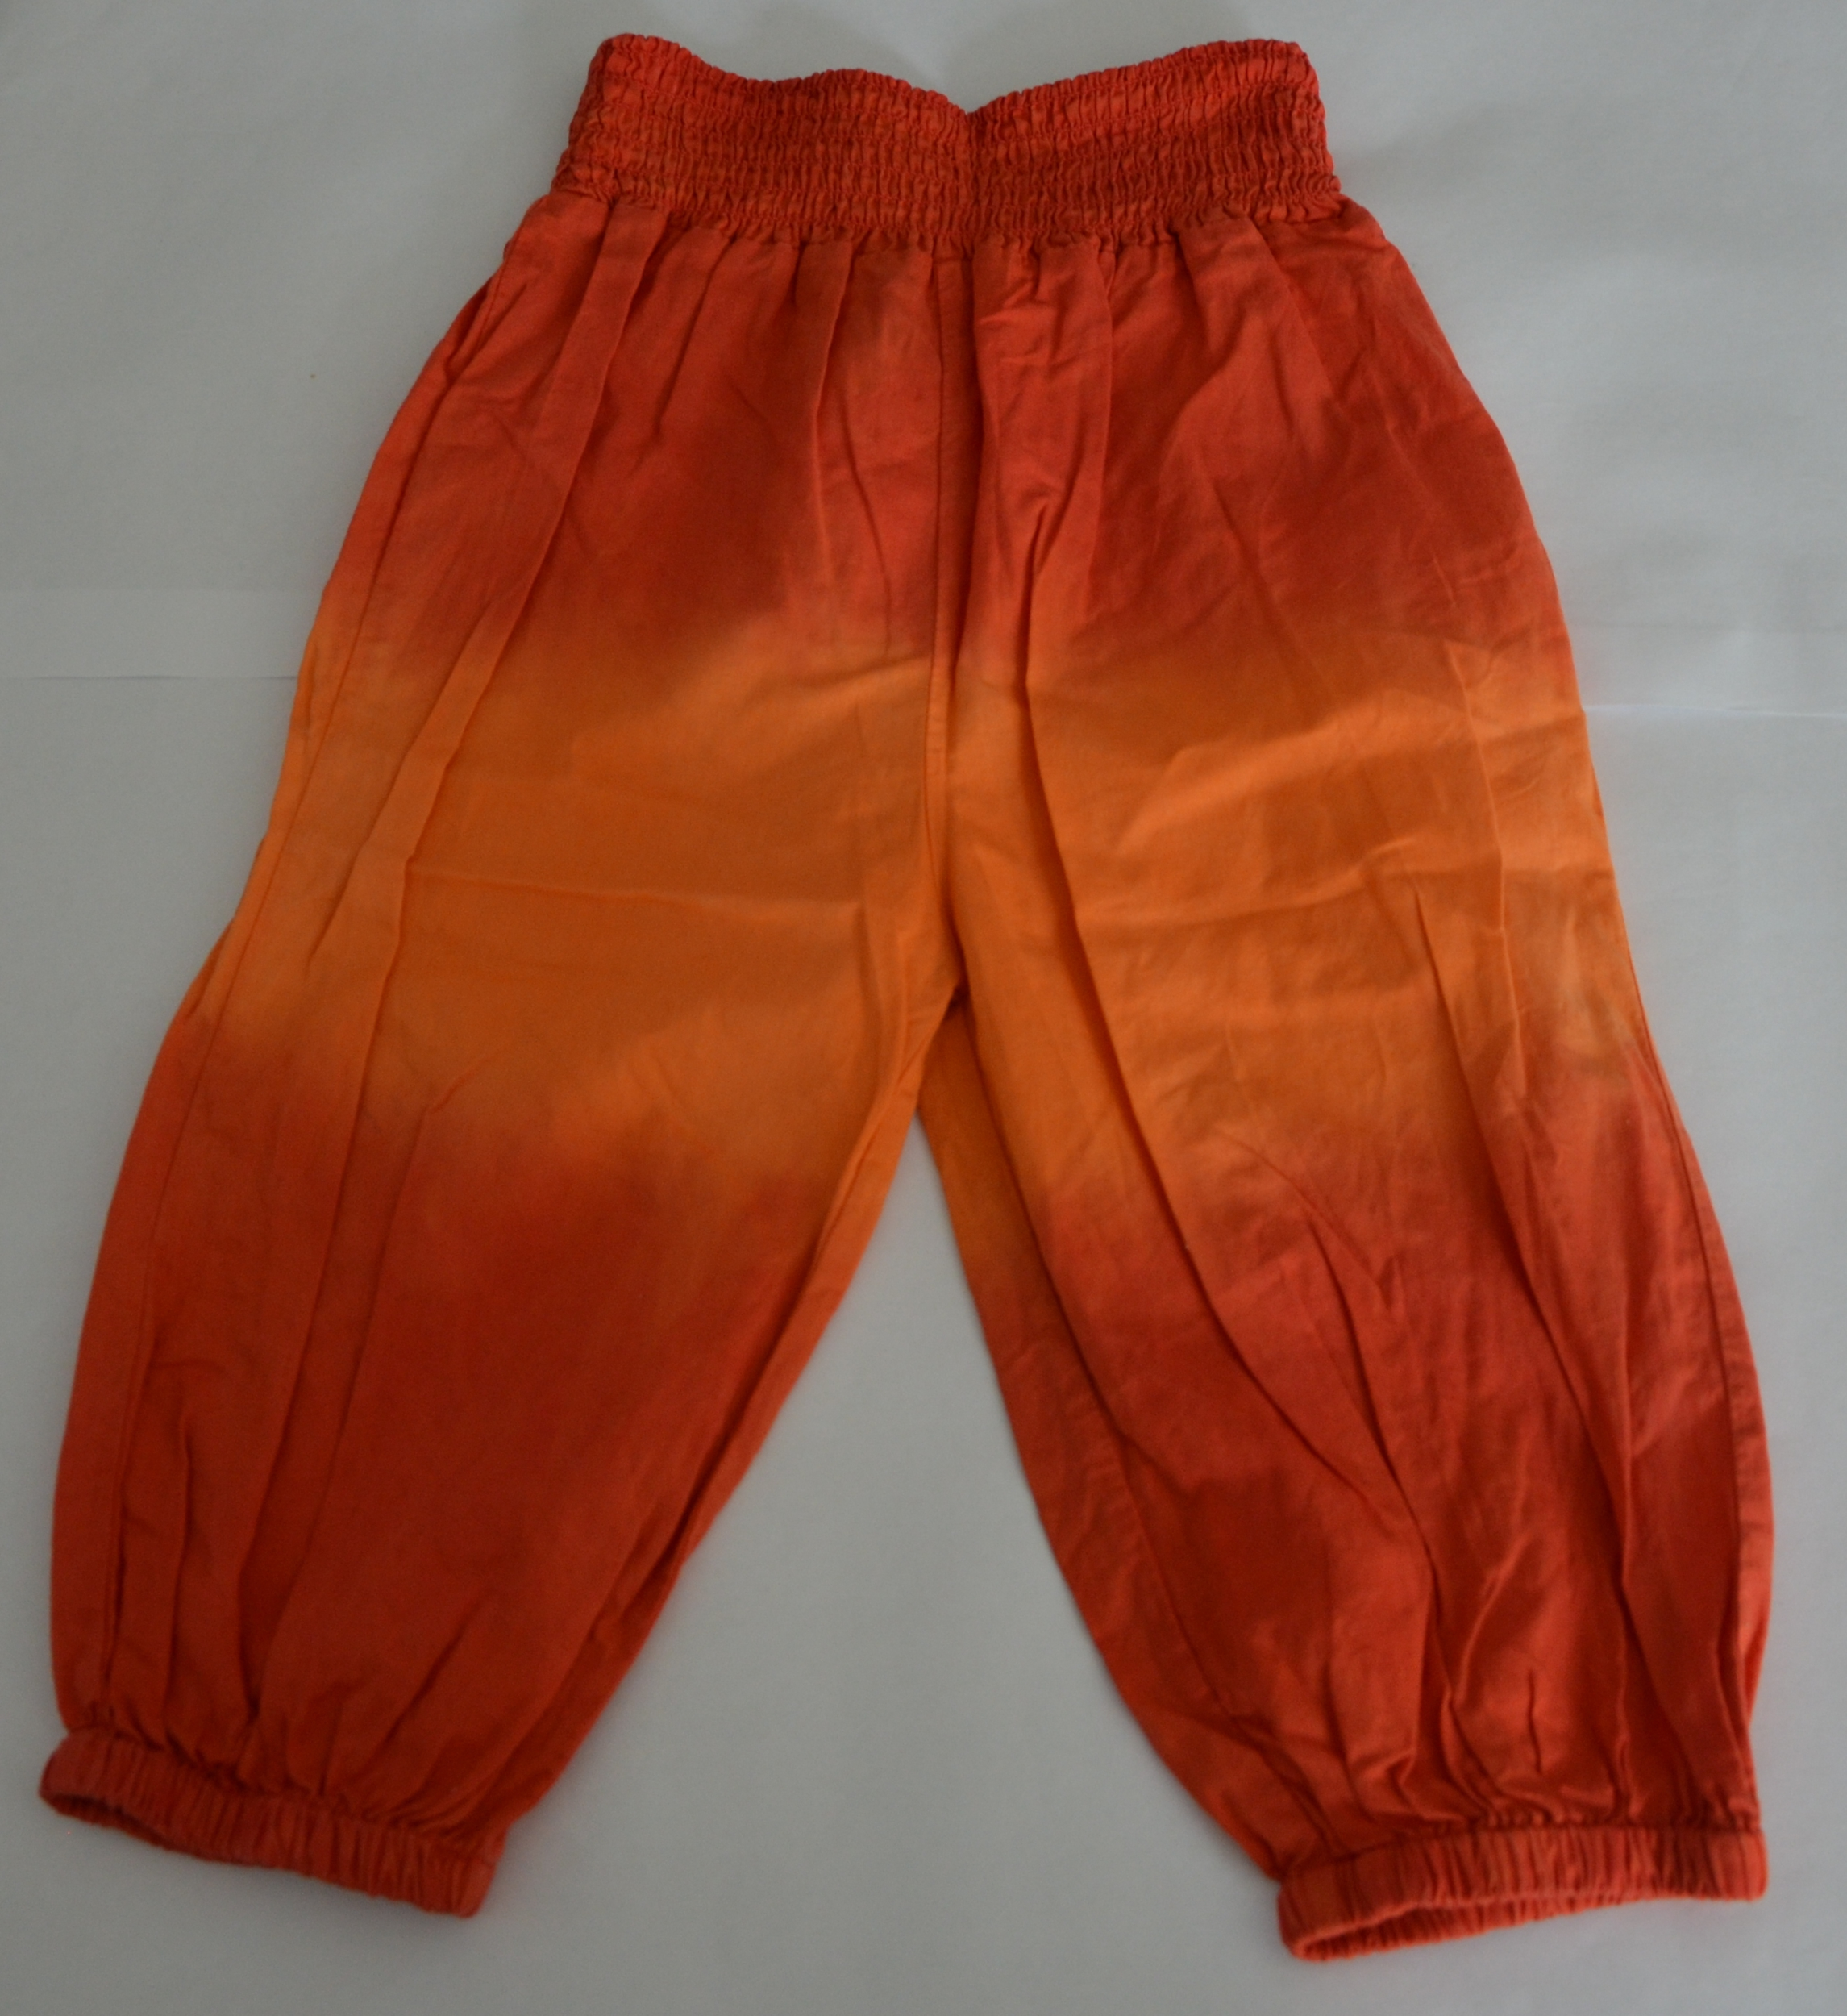 pantalon fille 18 mois occasion orchestra orange